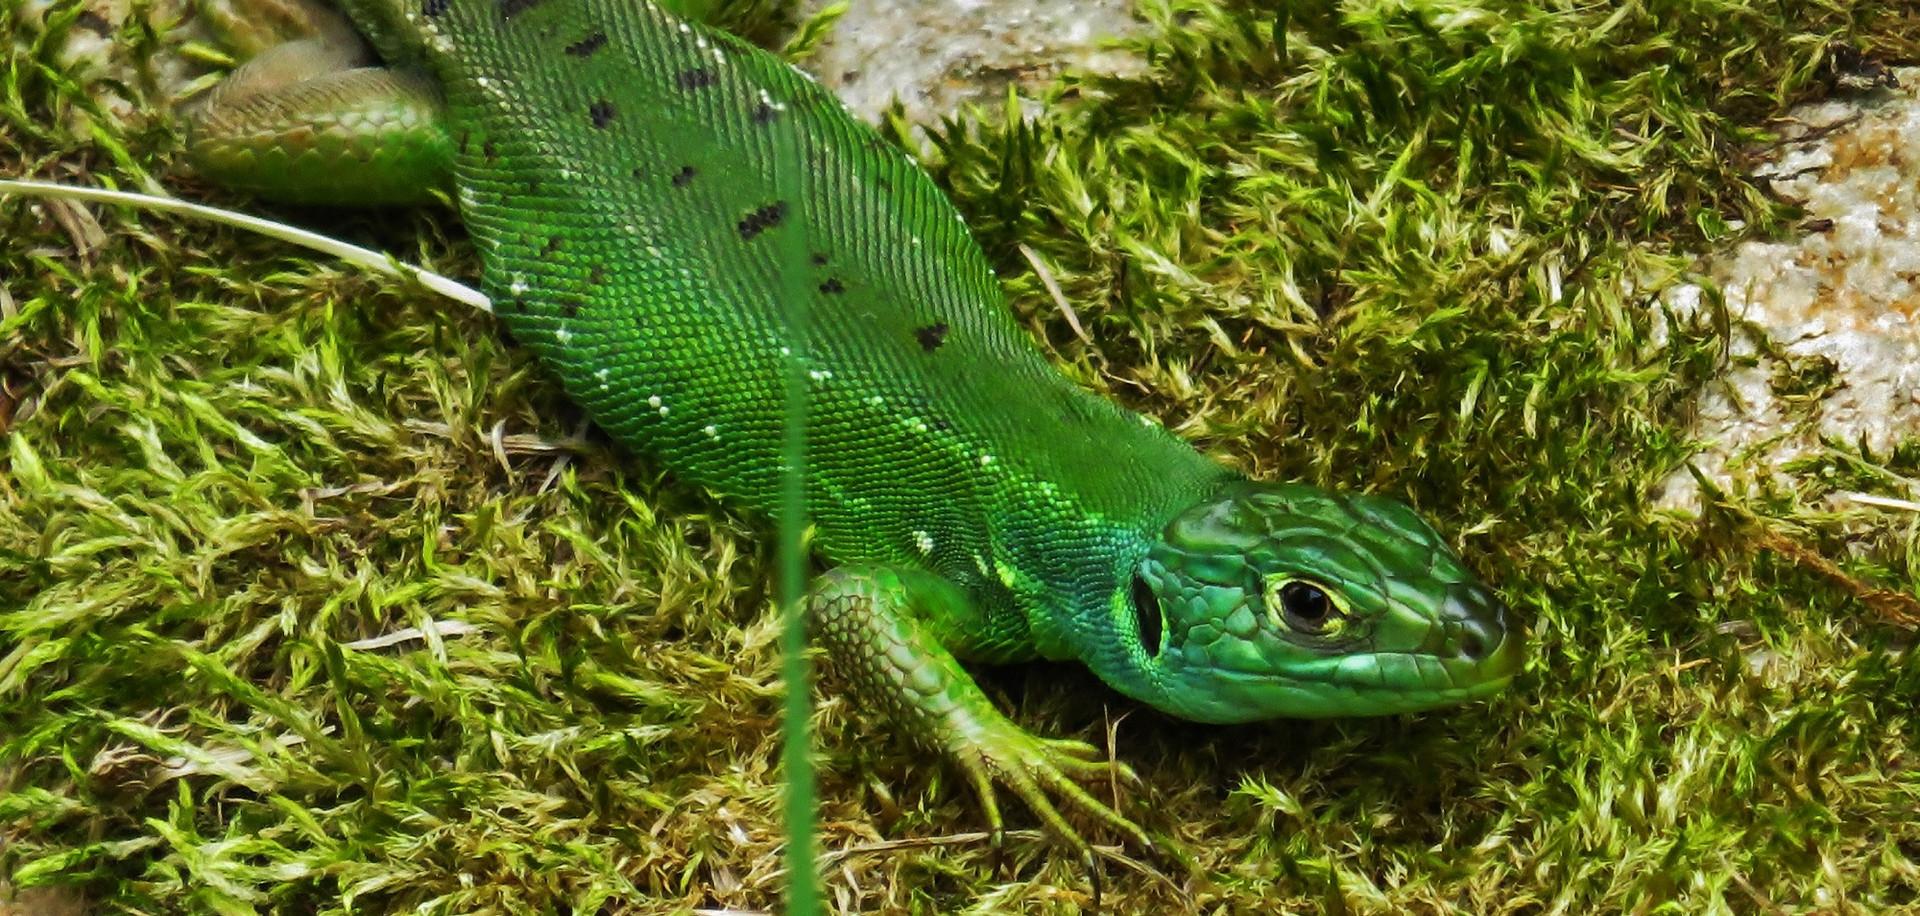 Western green lizard (lacerta bilineata), sub-adult female, Malcantone, Ticino, June 2015.jpg